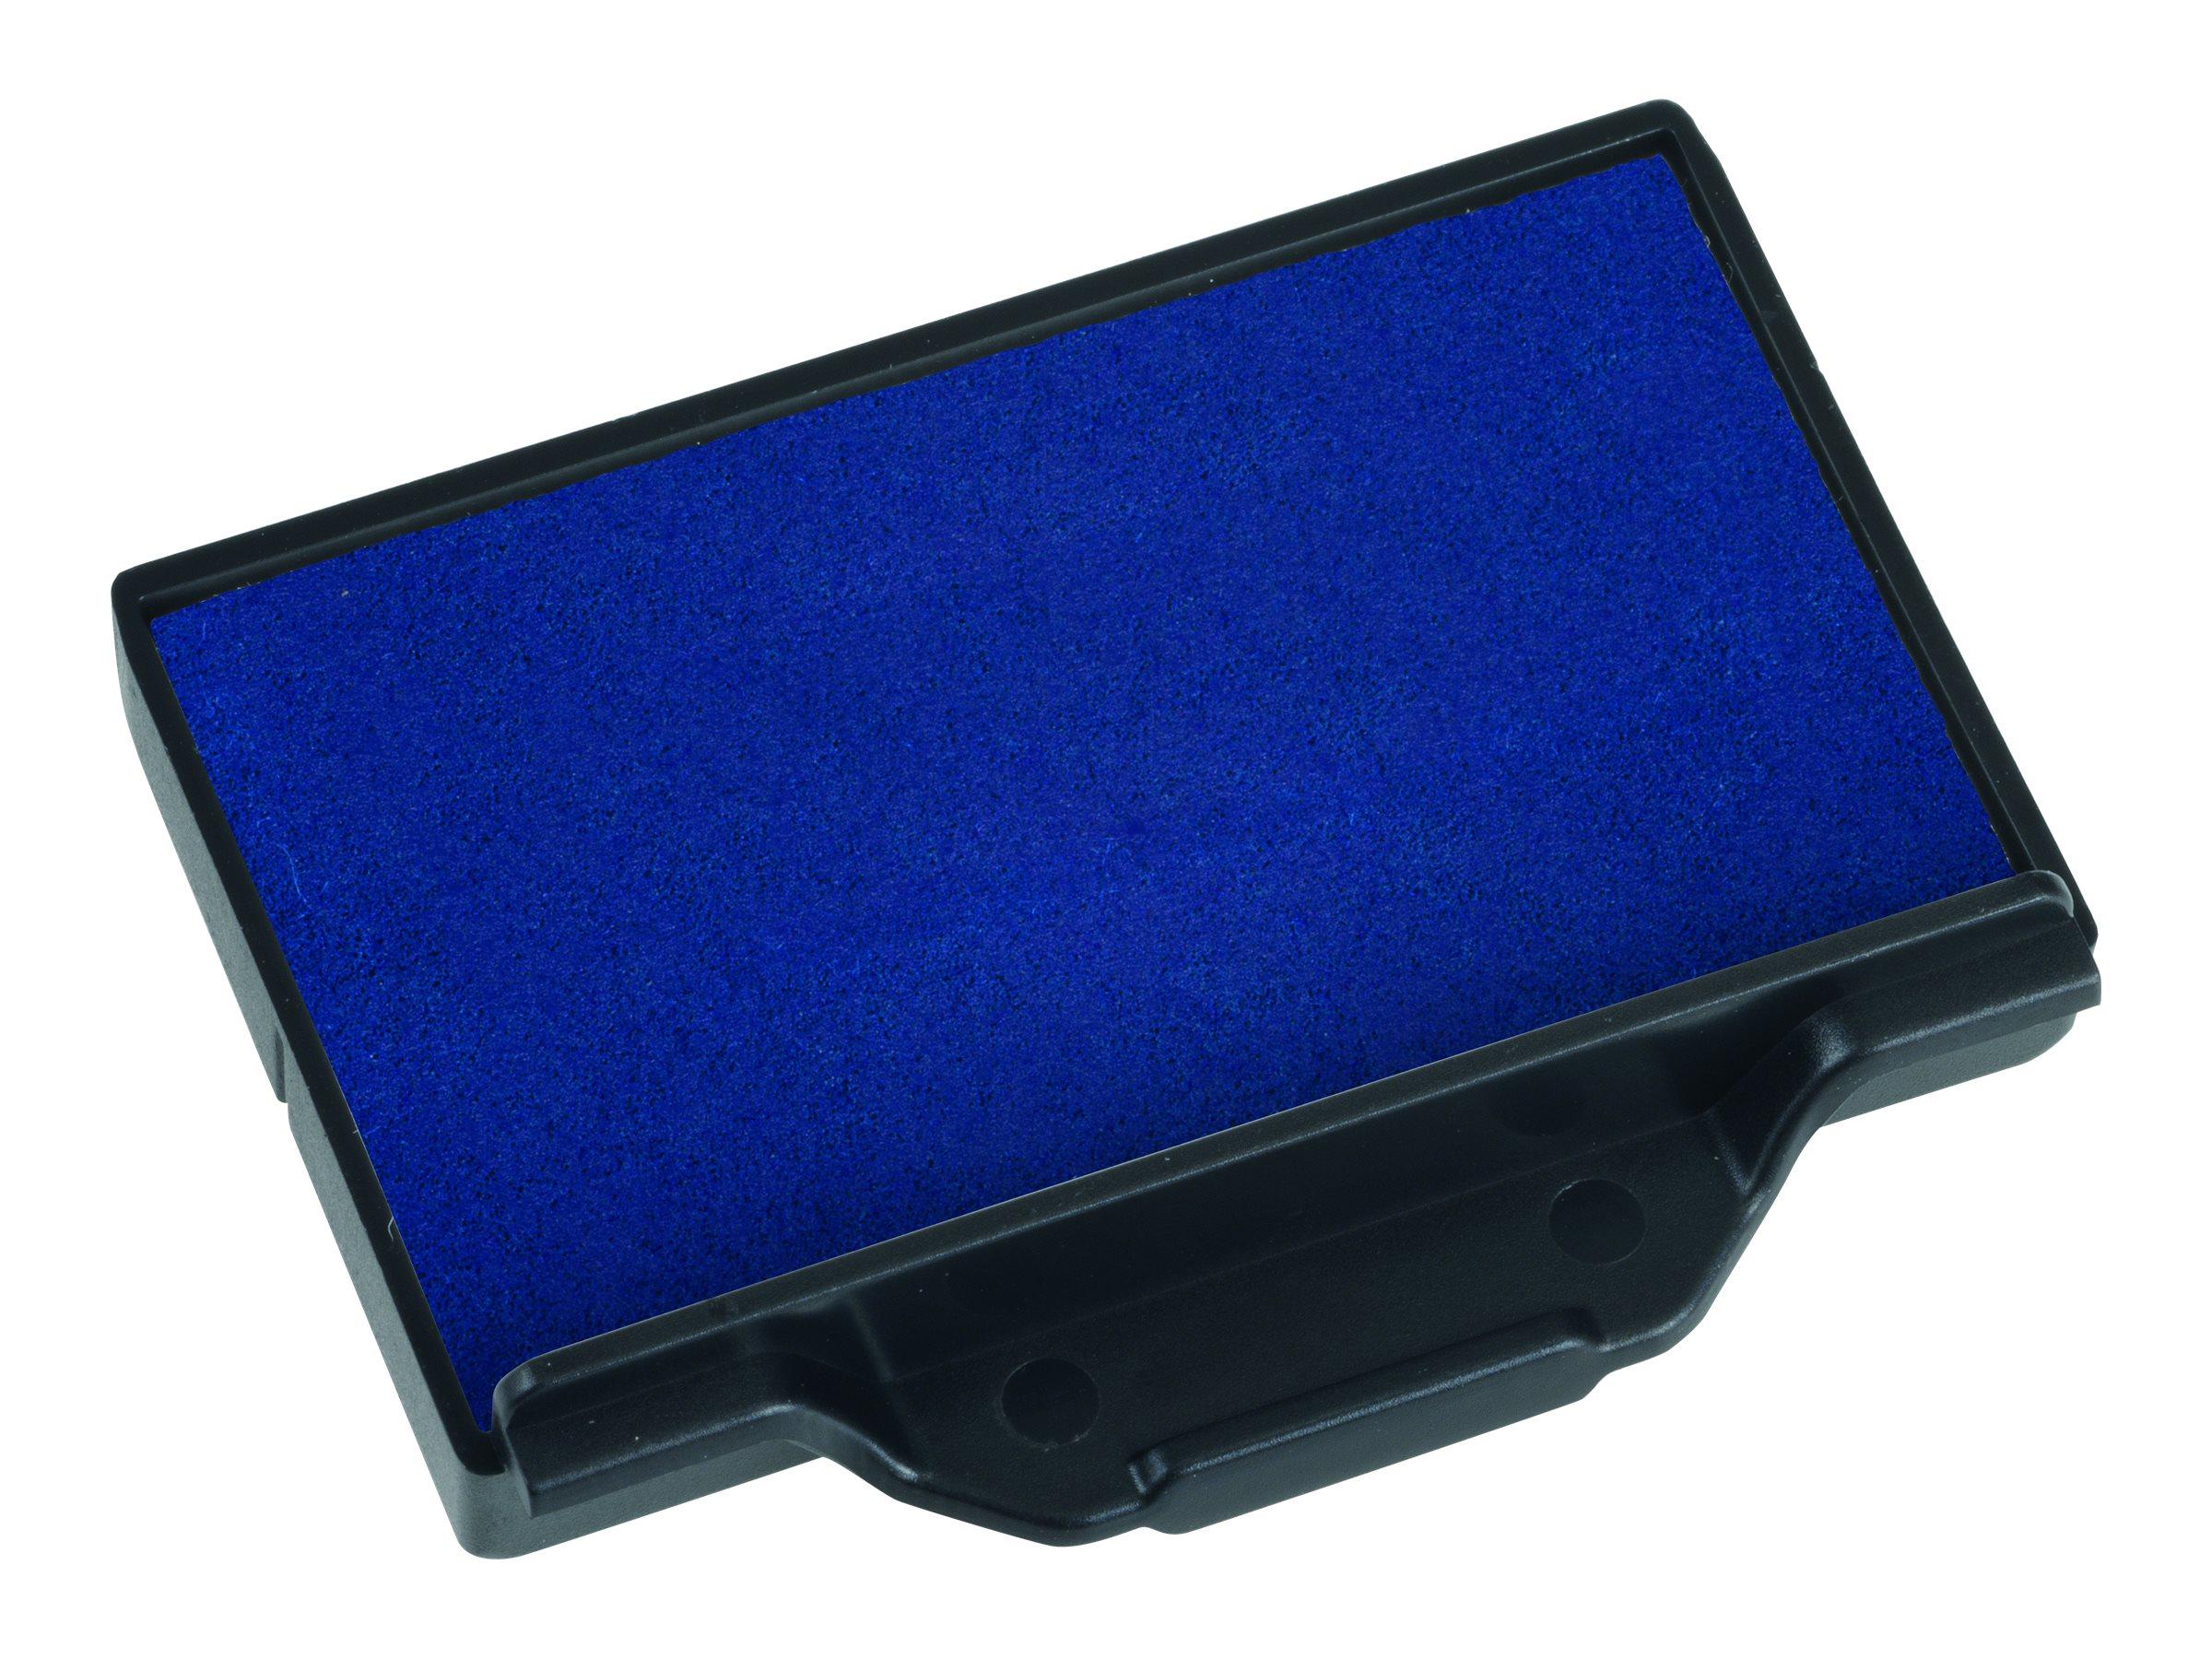 Trodat - Encrier 6/53 recharge pour tampon 5203/5253/5440 - bleu